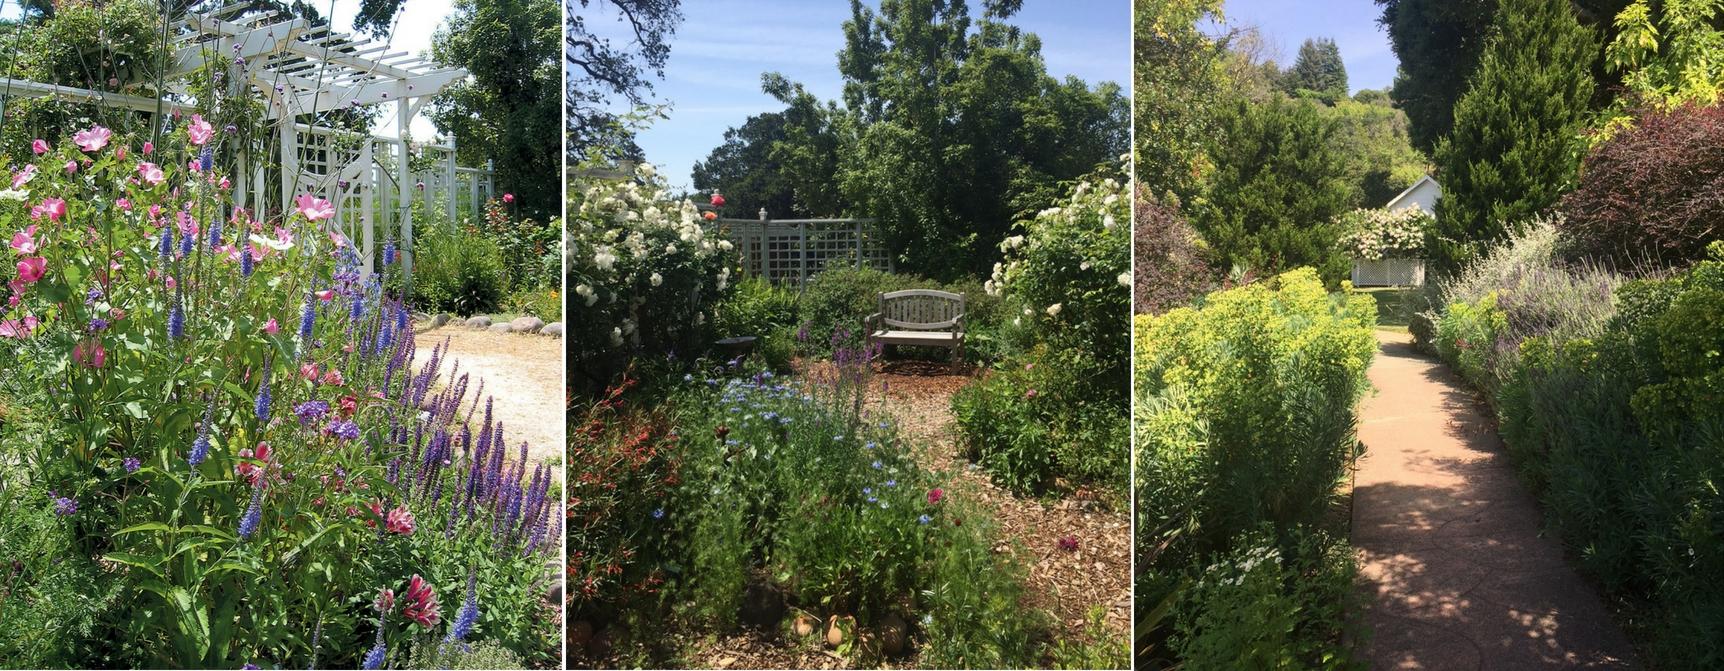 Falkirk Garden Images